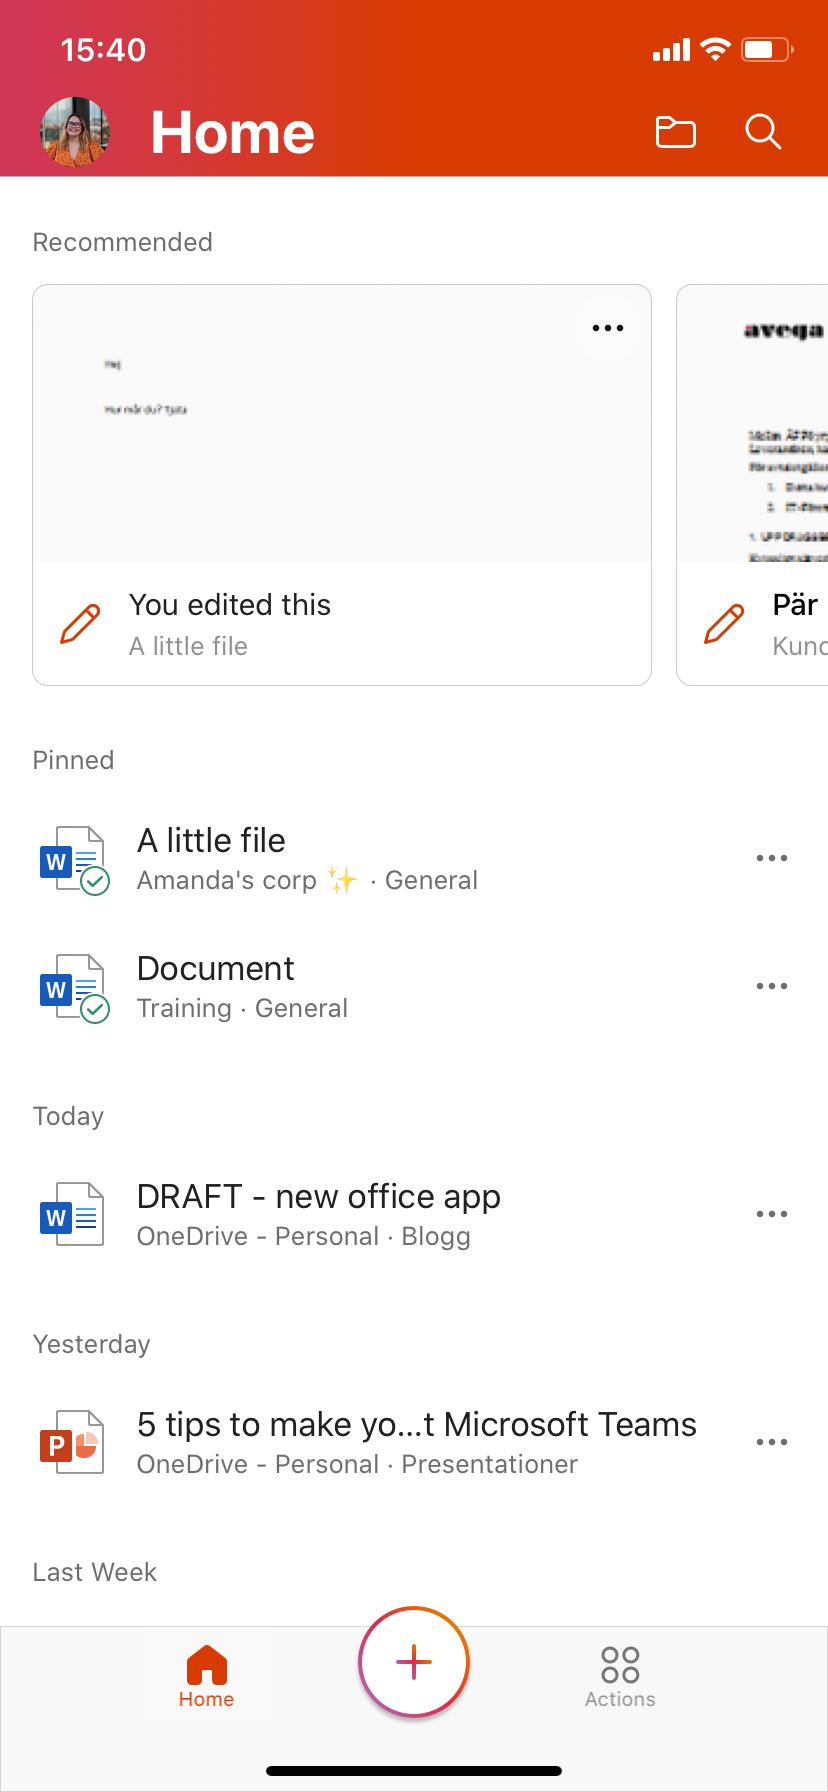 Home screen in Office app